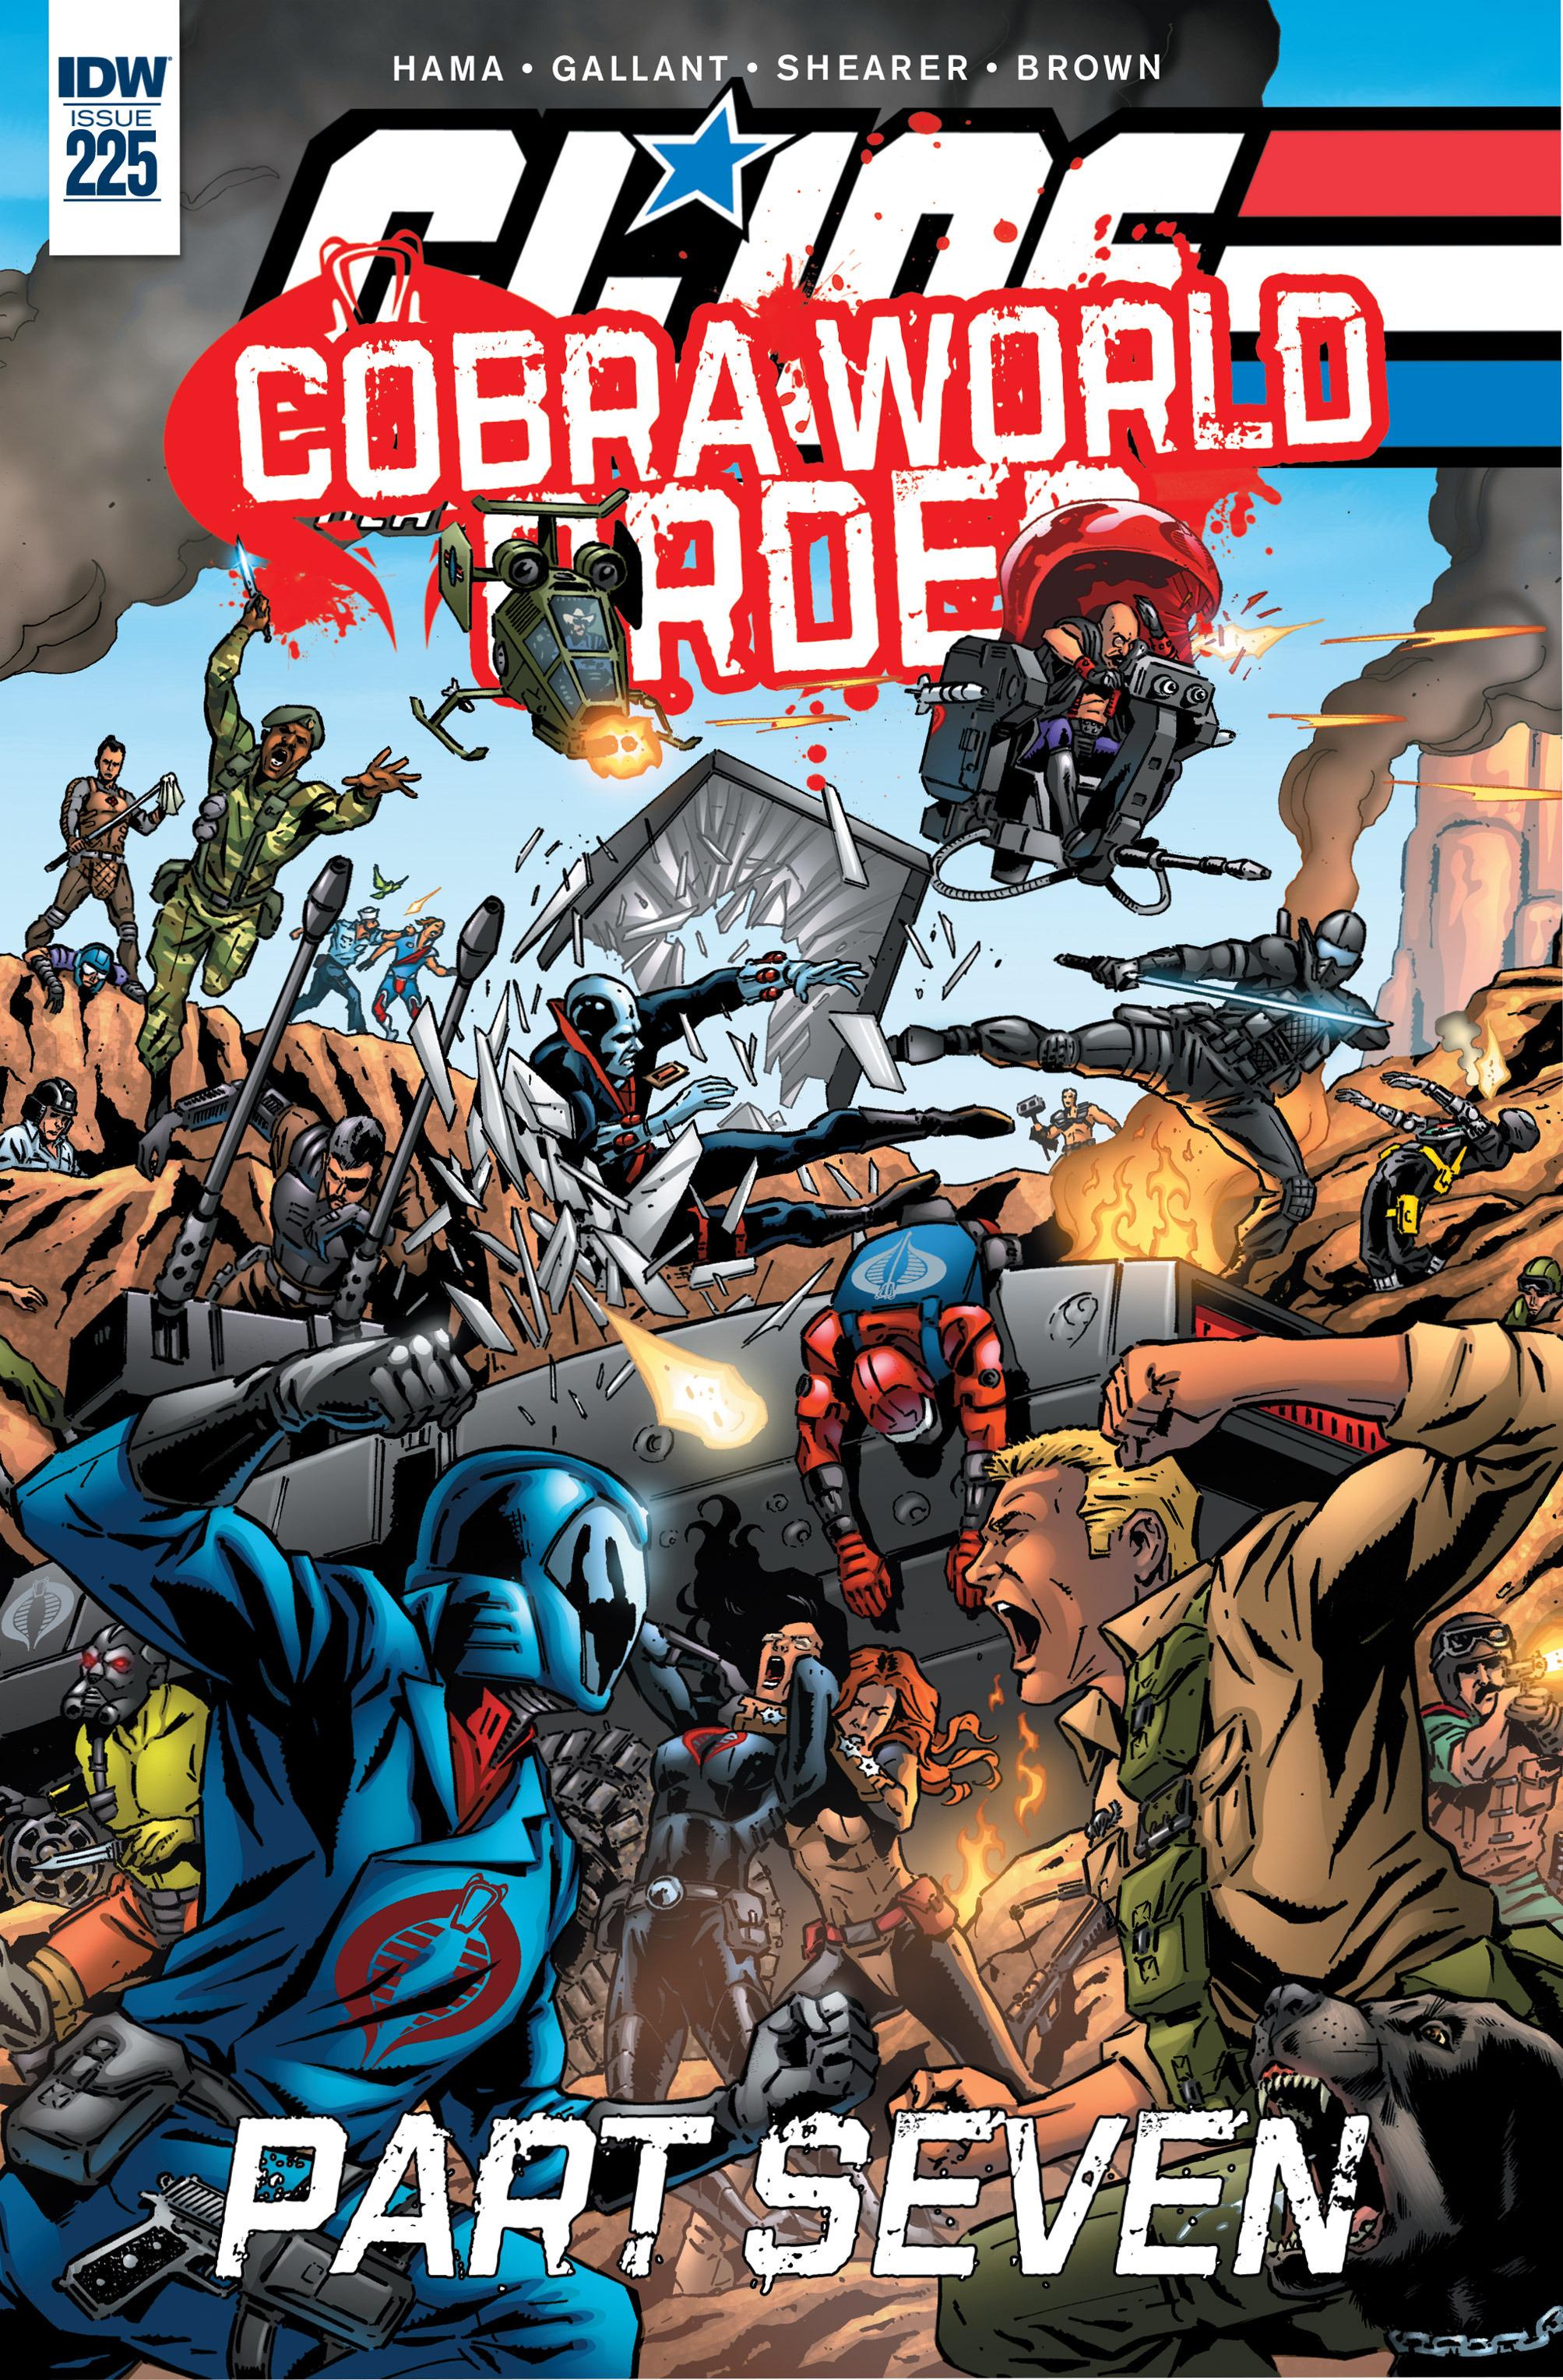 G.I. Joe: A Real American Hero 225 Page 1